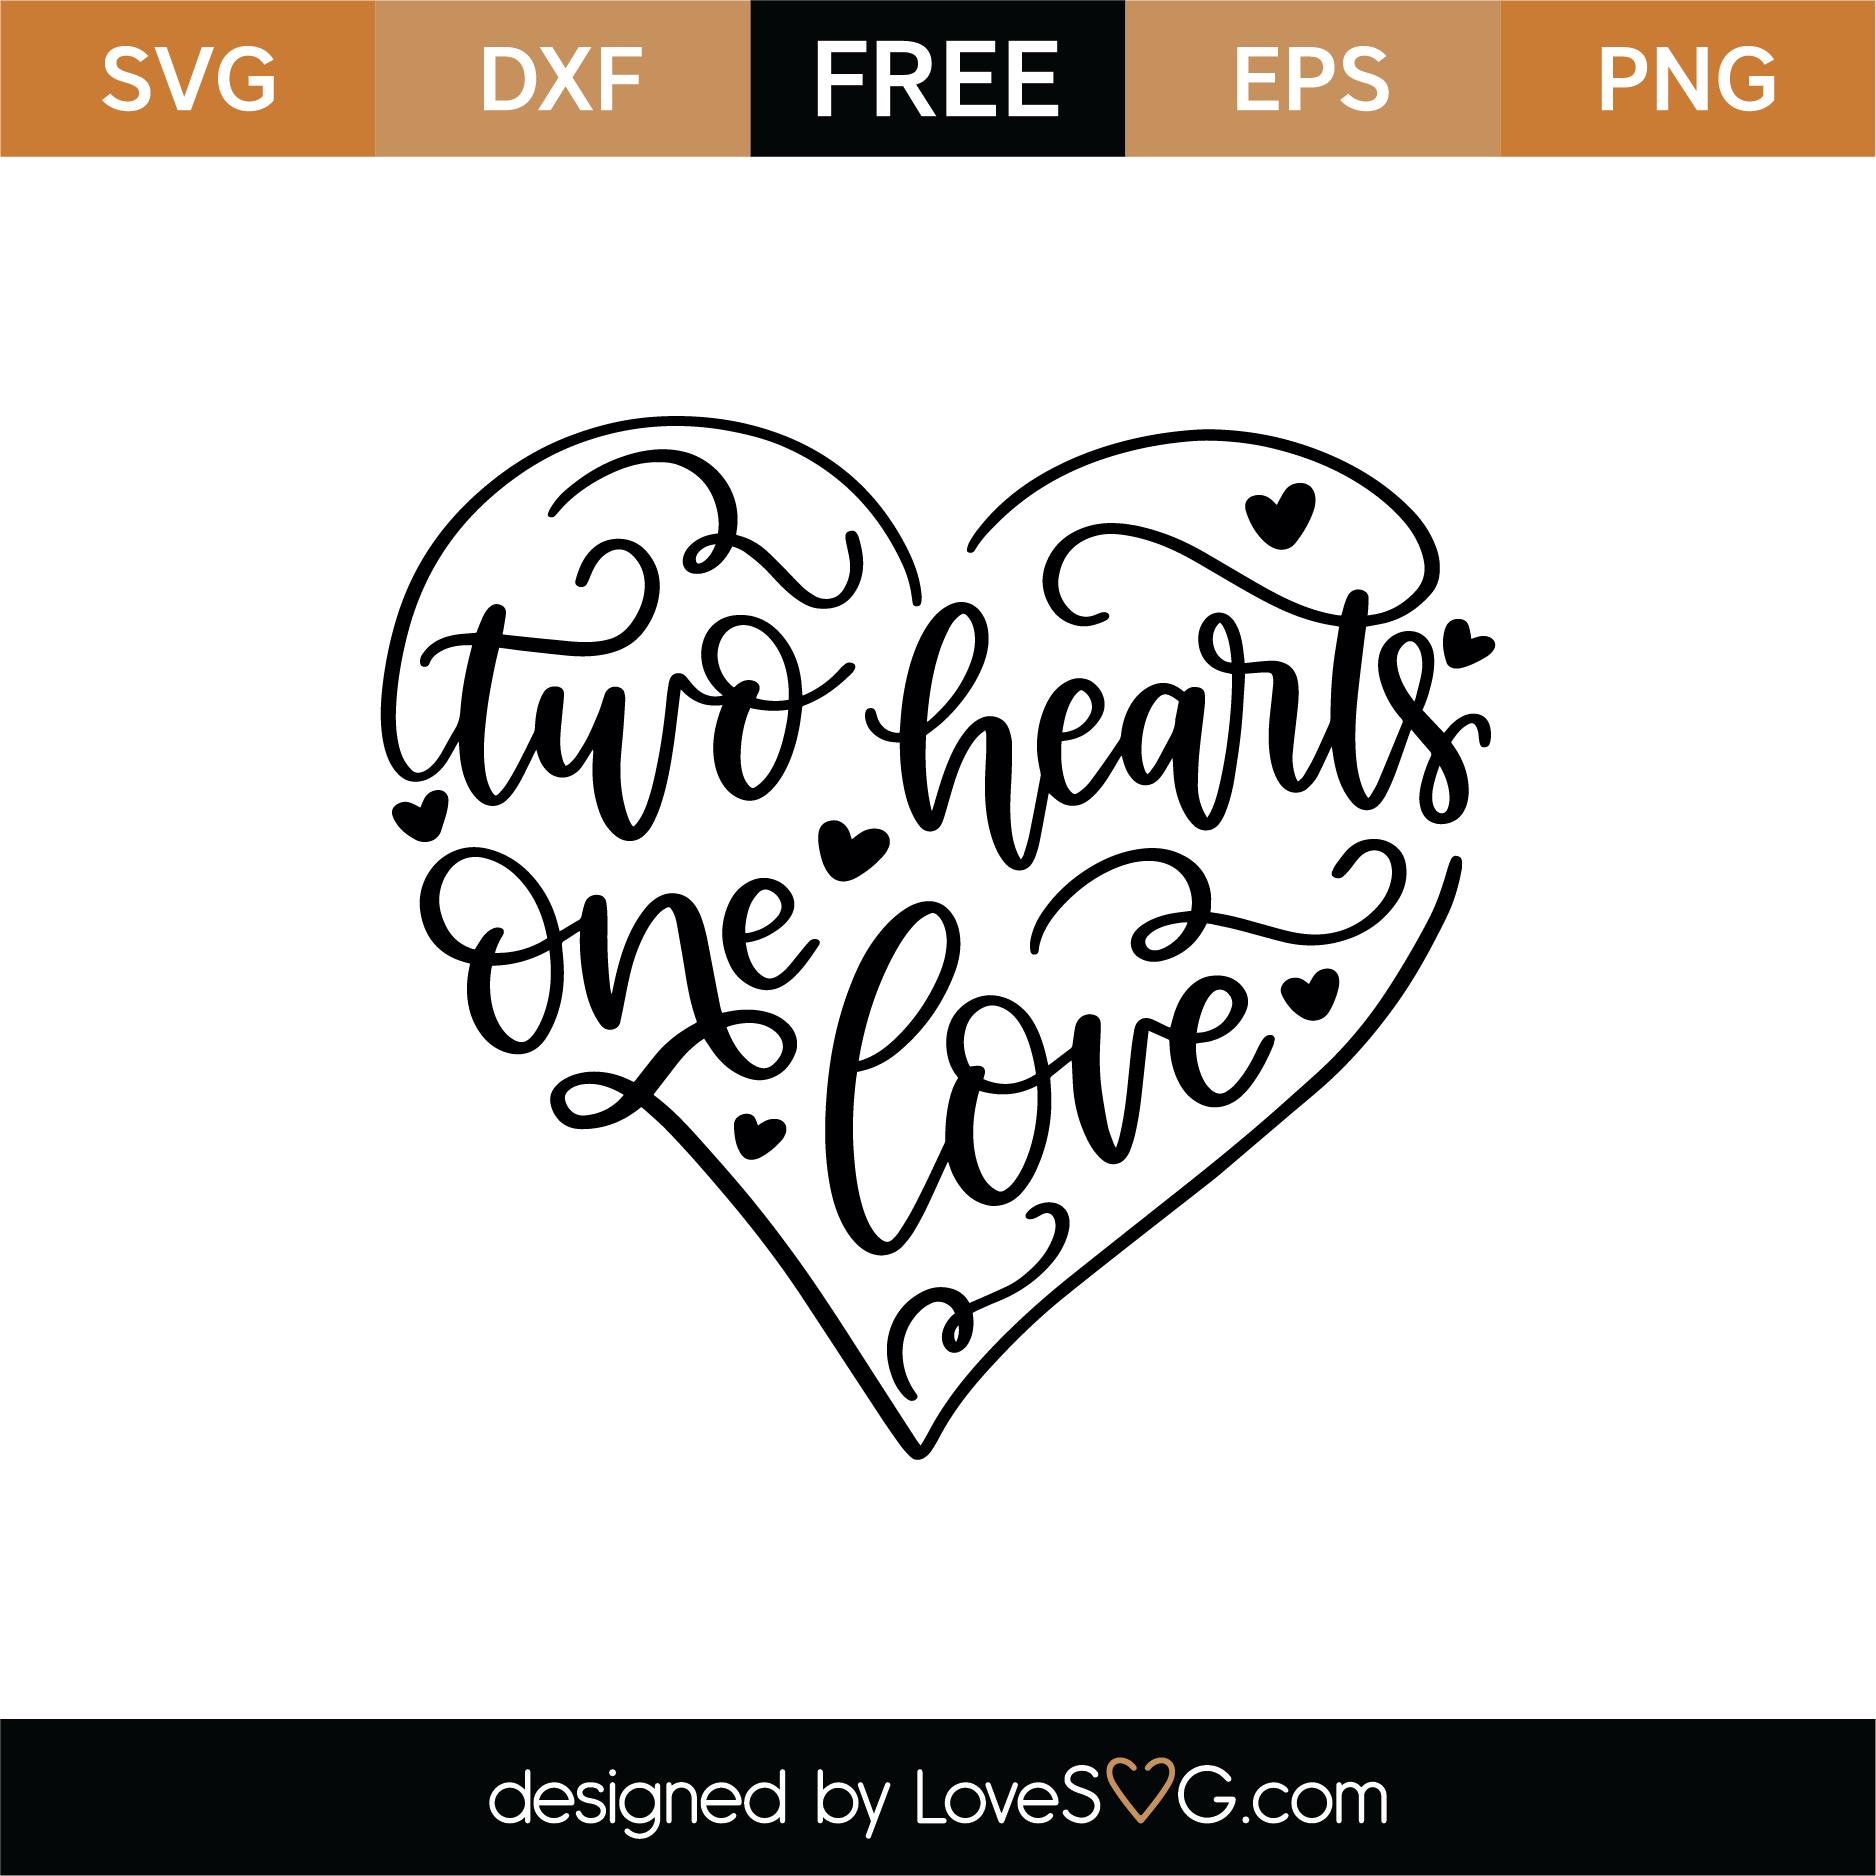 Download Free Two Hearts One Love SVG Cut File | Lovesvg.com